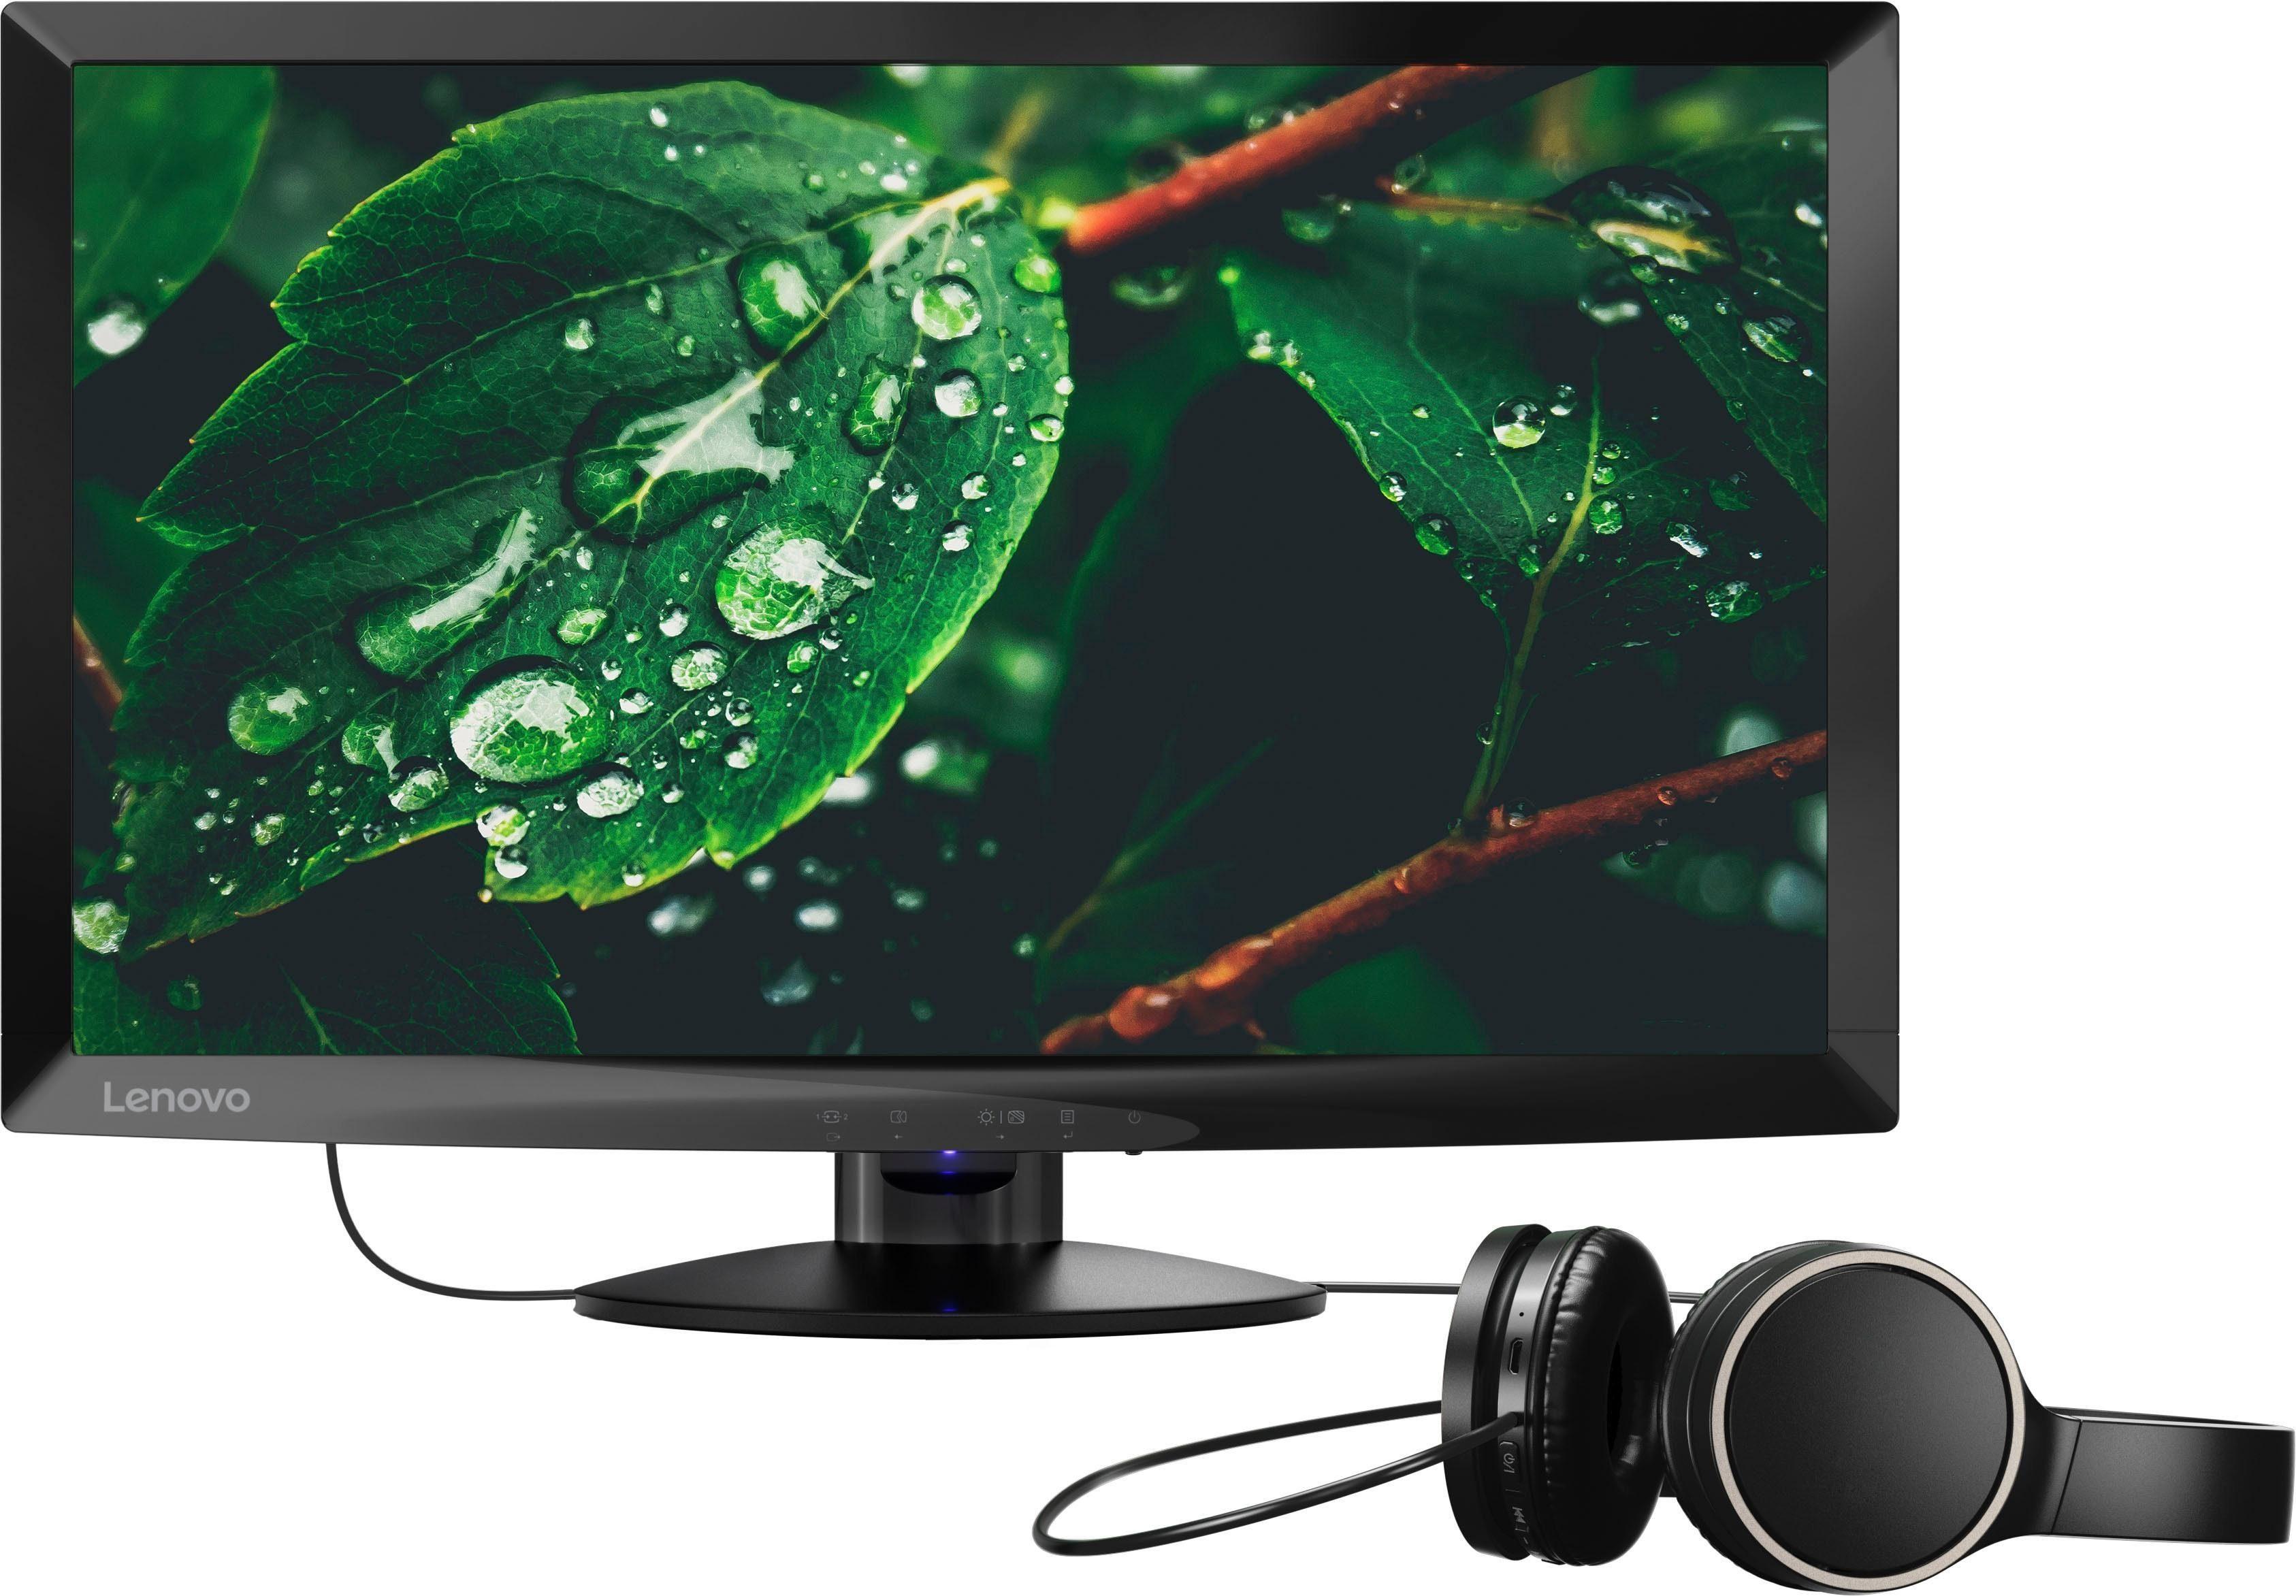 Lenovo C24-10 LED-Monitor (1920 x 1080 Pixel, Full HD, 1 ms Reaktionszeit)